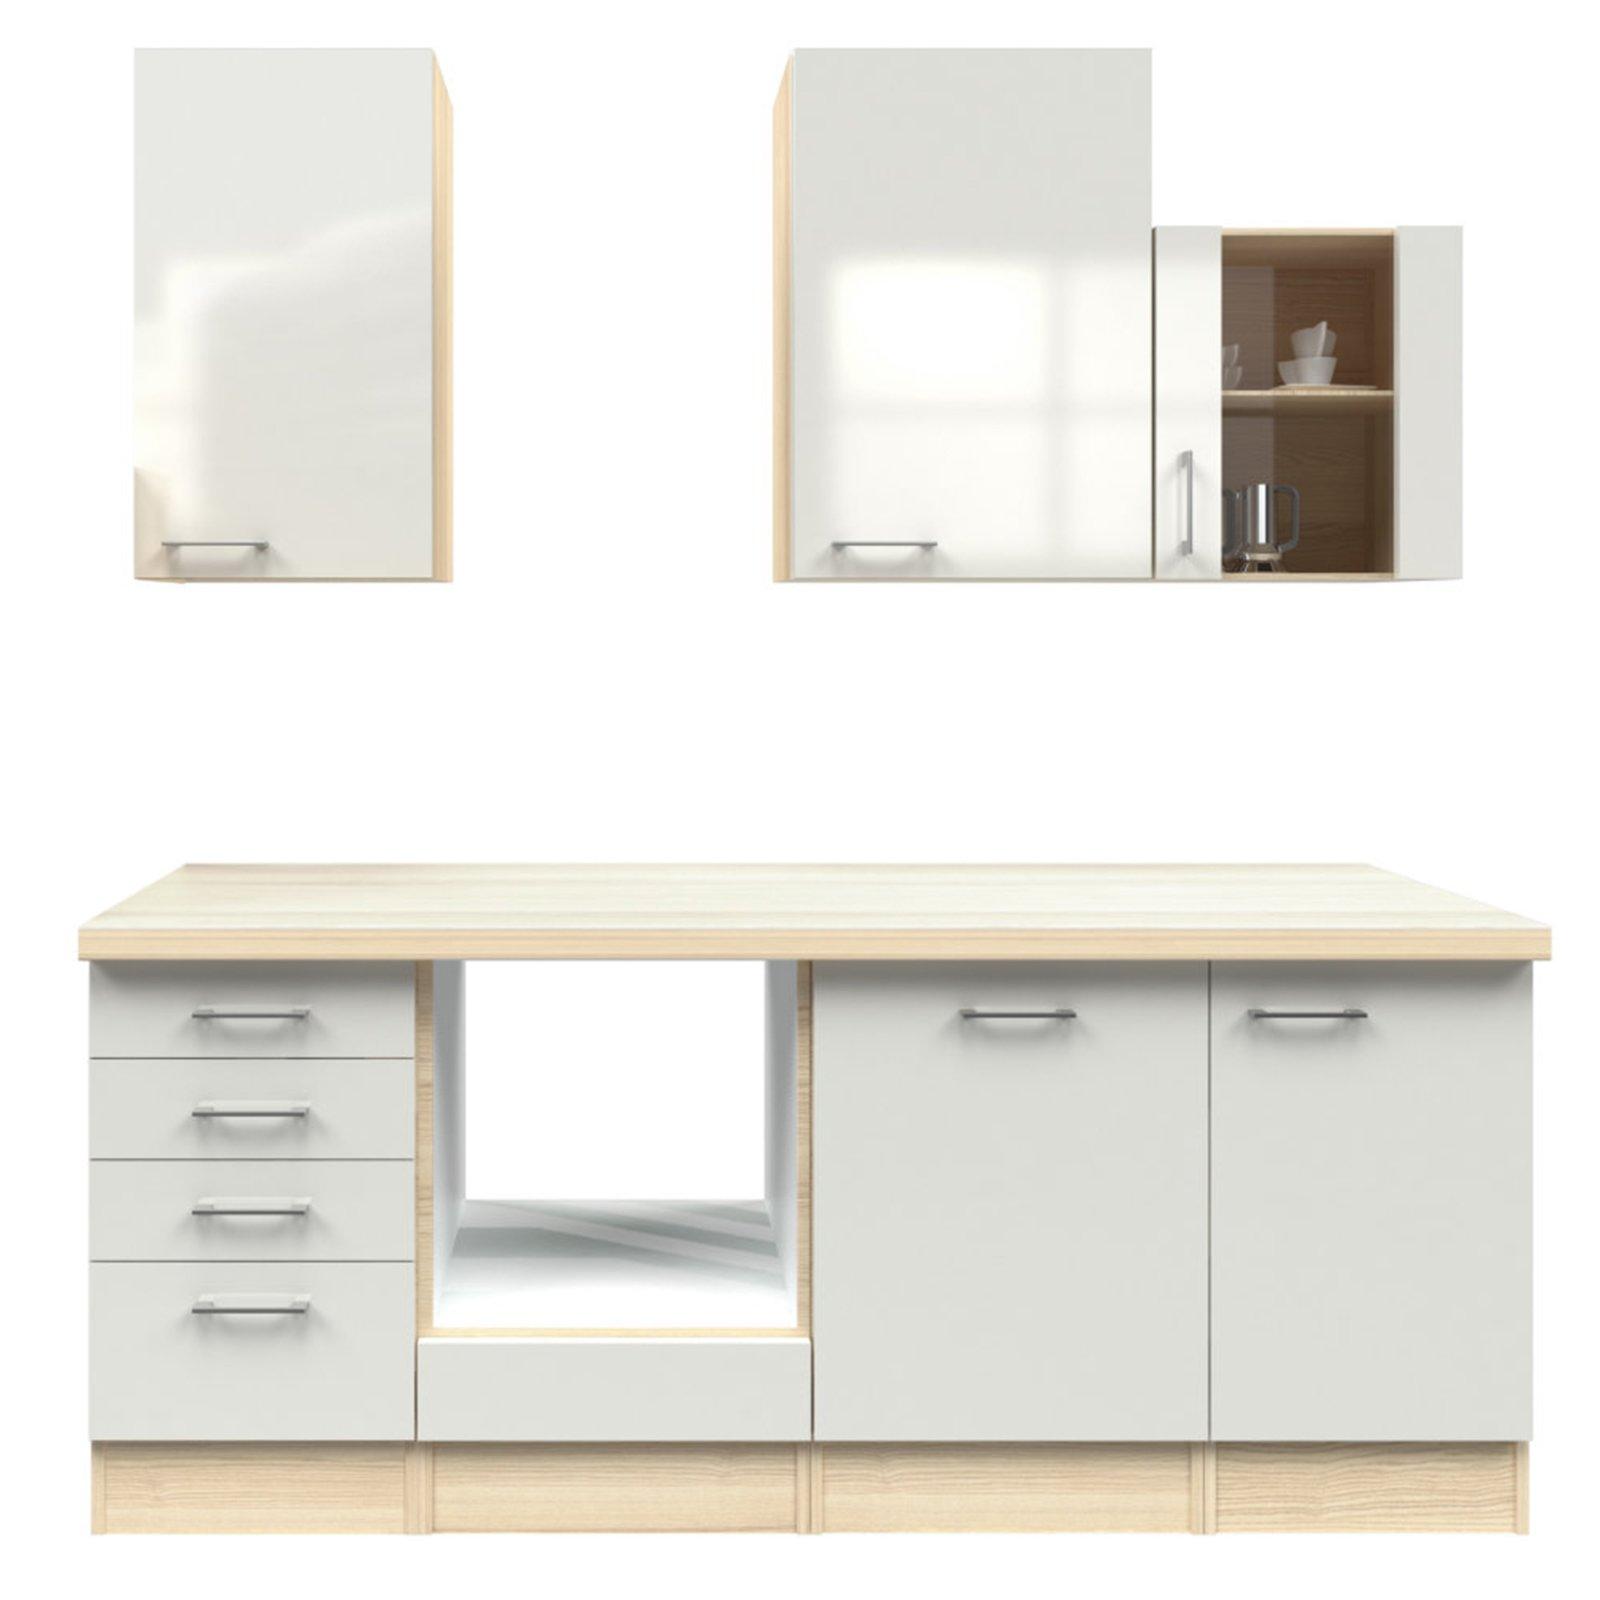 k chenblock abaco perlmutt akazie 220 cm k chenzeilen ohne e ger te k chenzeilen m bel. Black Bedroom Furniture Sets. Home Design Ideas